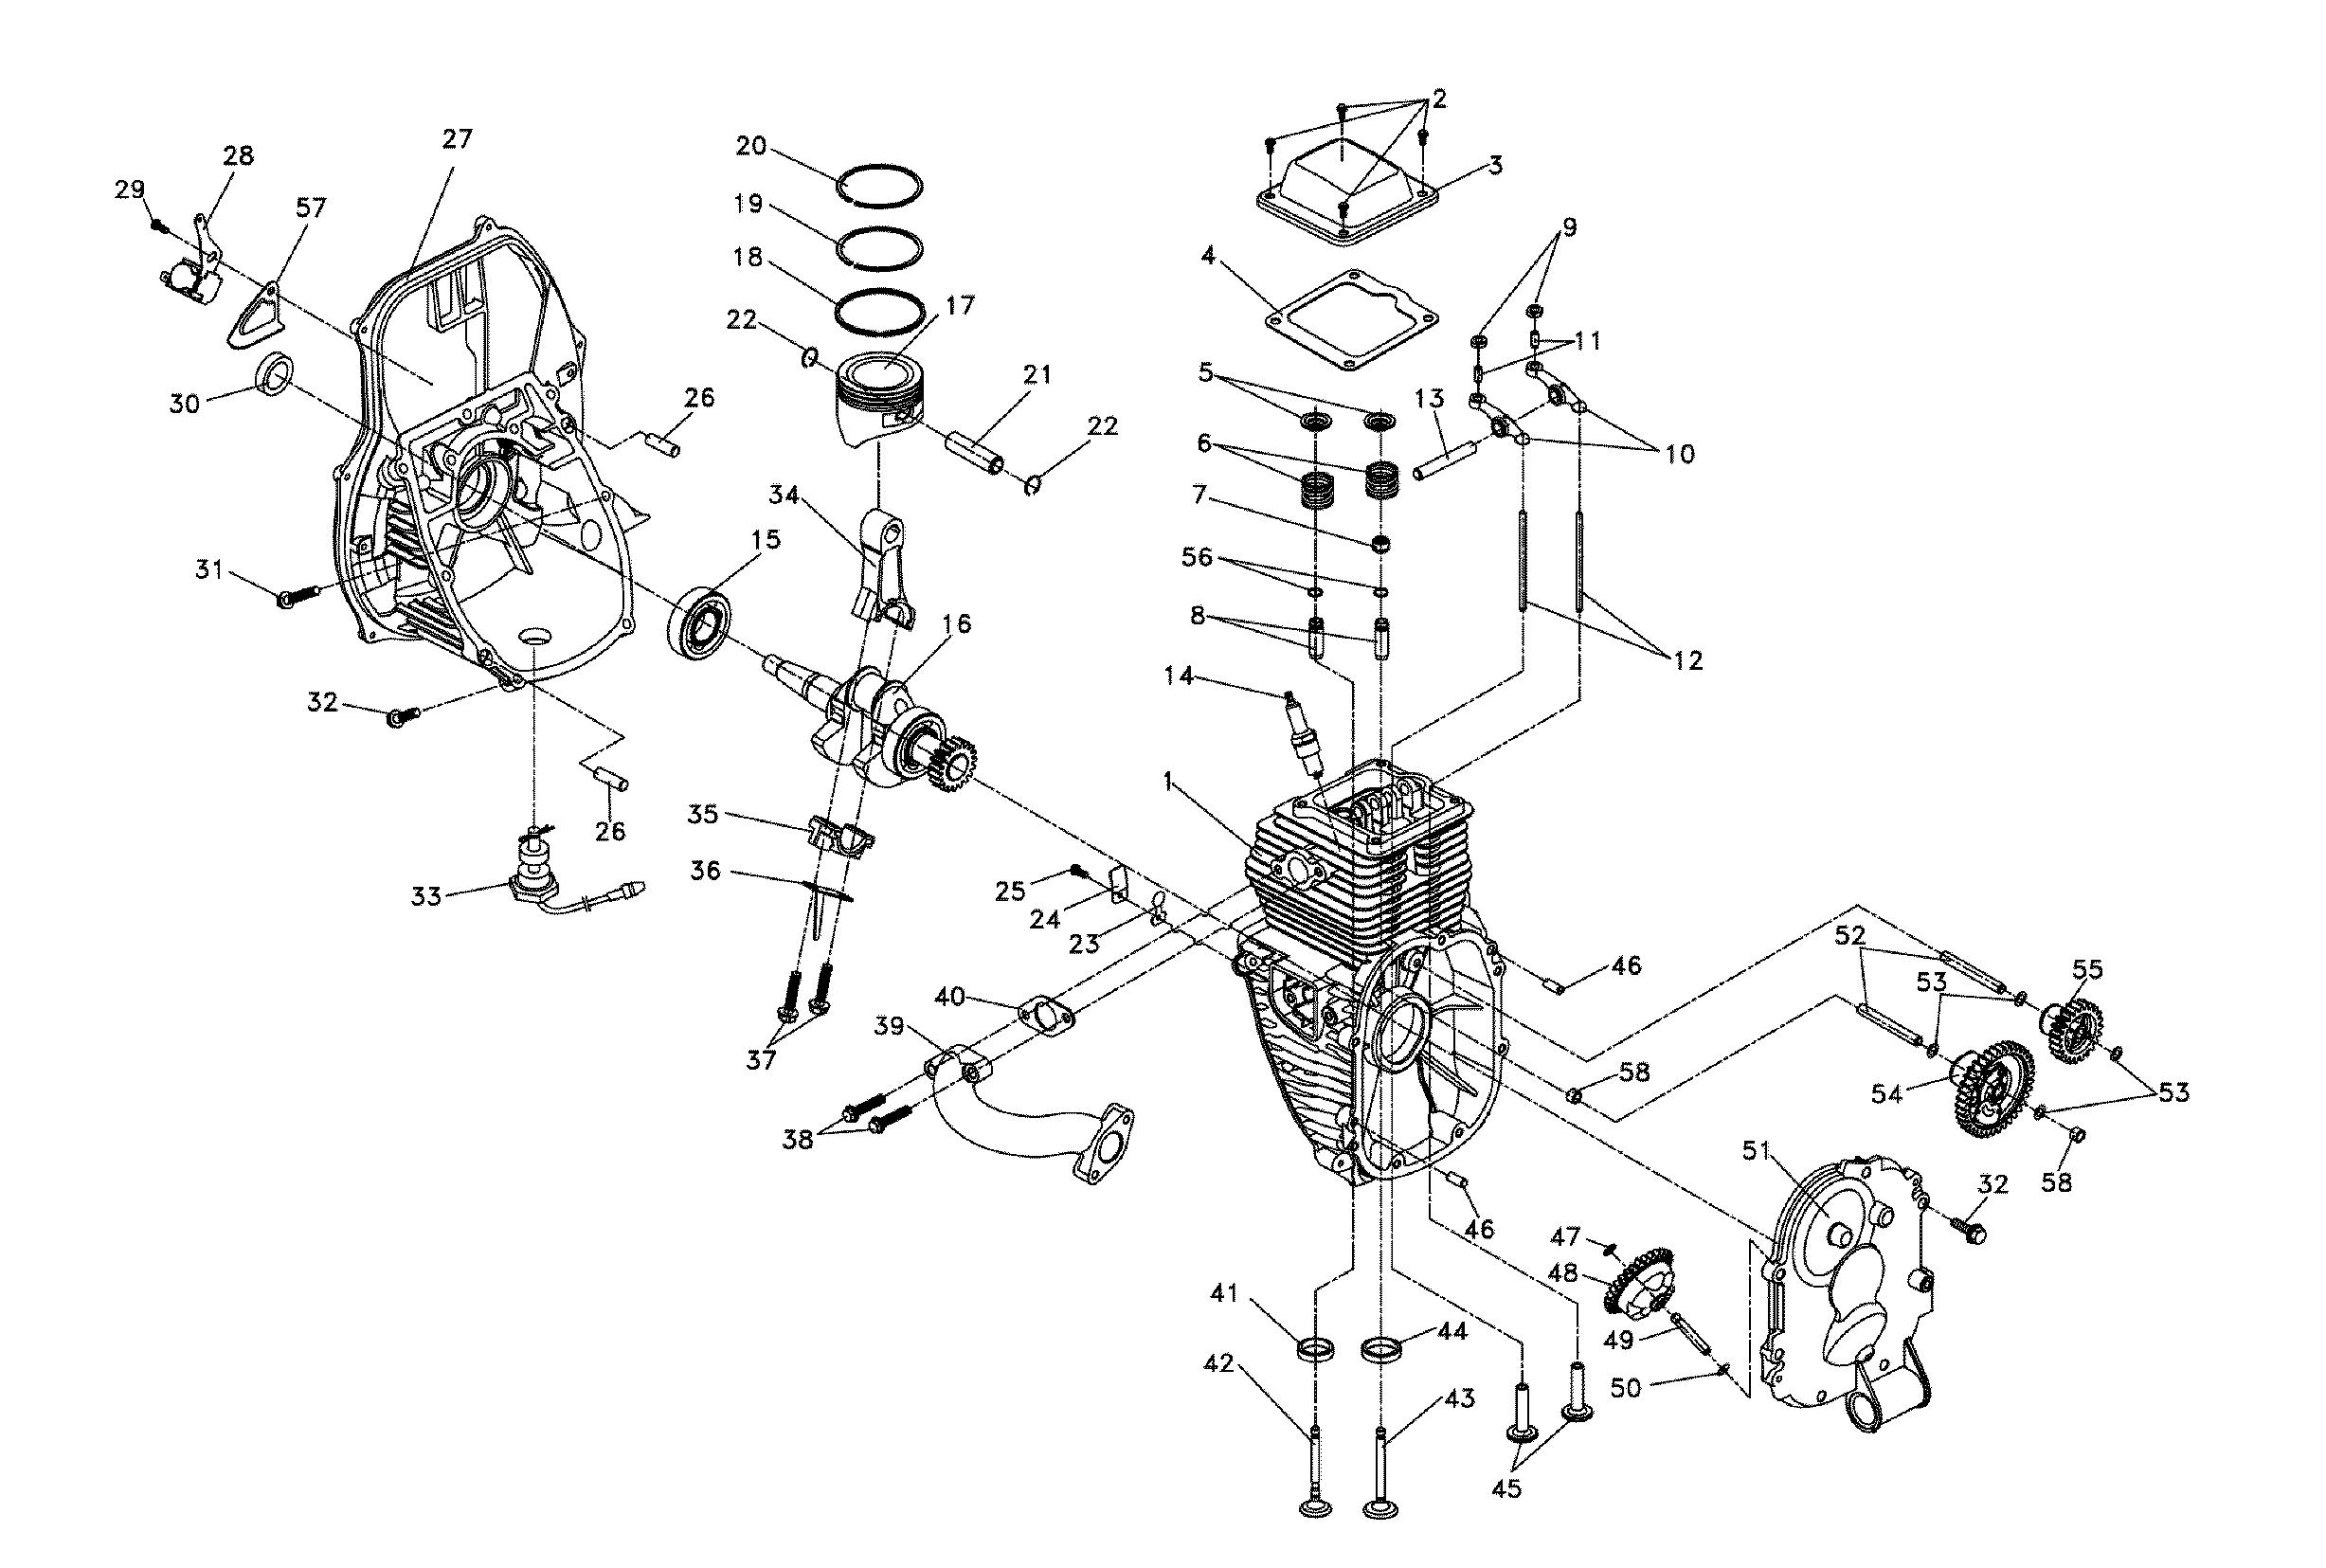 Generac model IX2000-5793-0 generator genuine parts